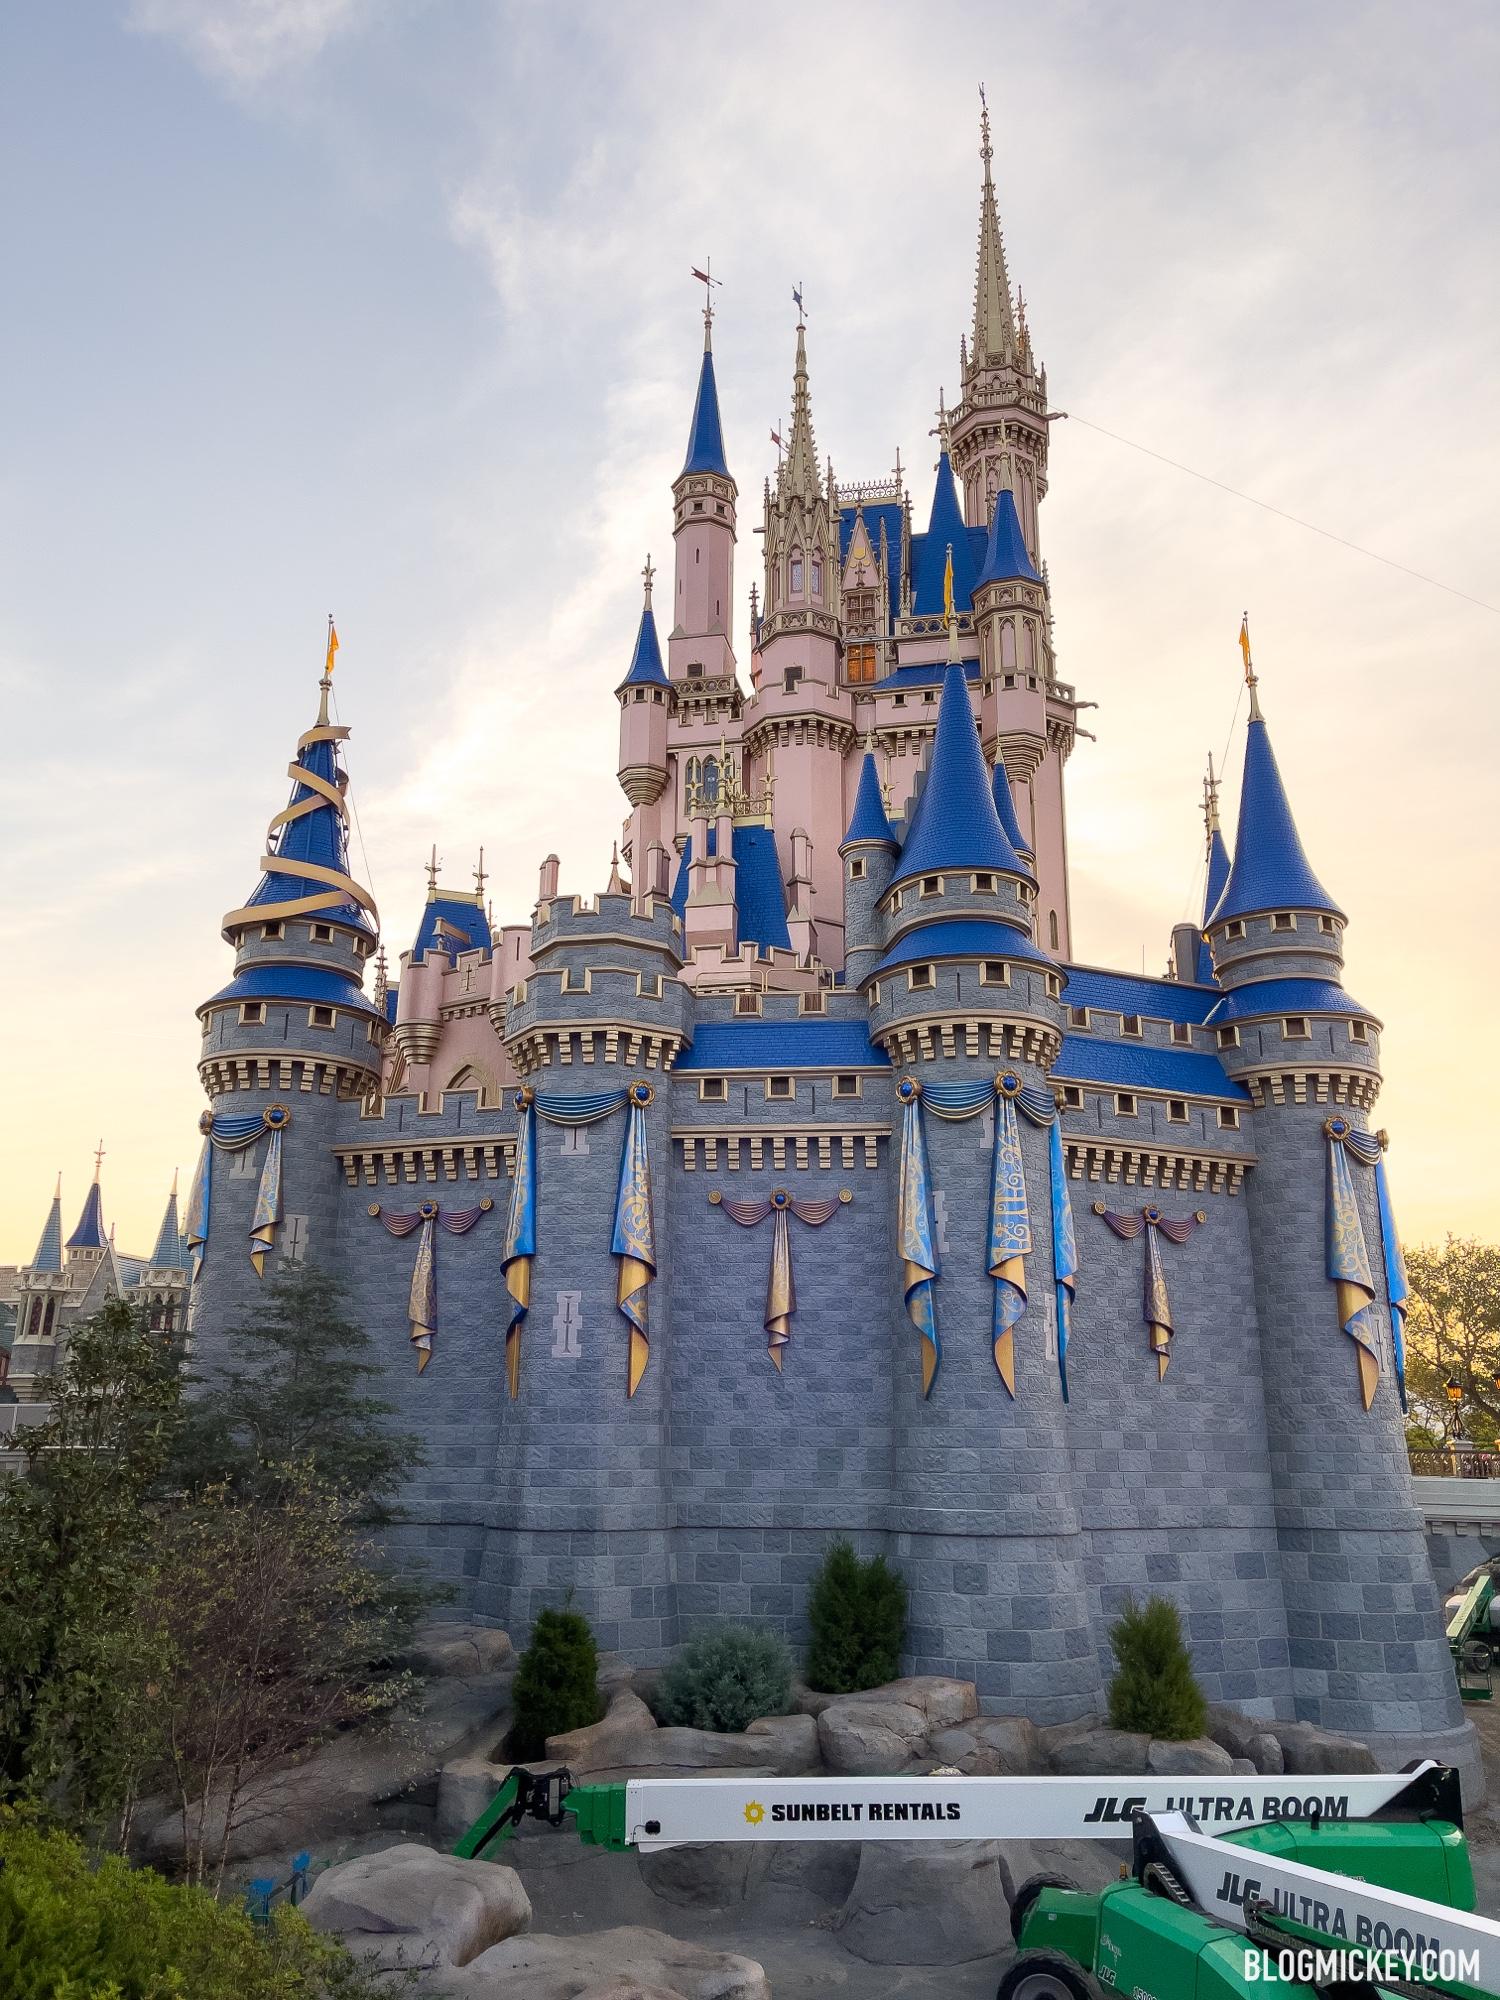 cinderella-castle-turret-decoration-50th-anniversary-10.jpg